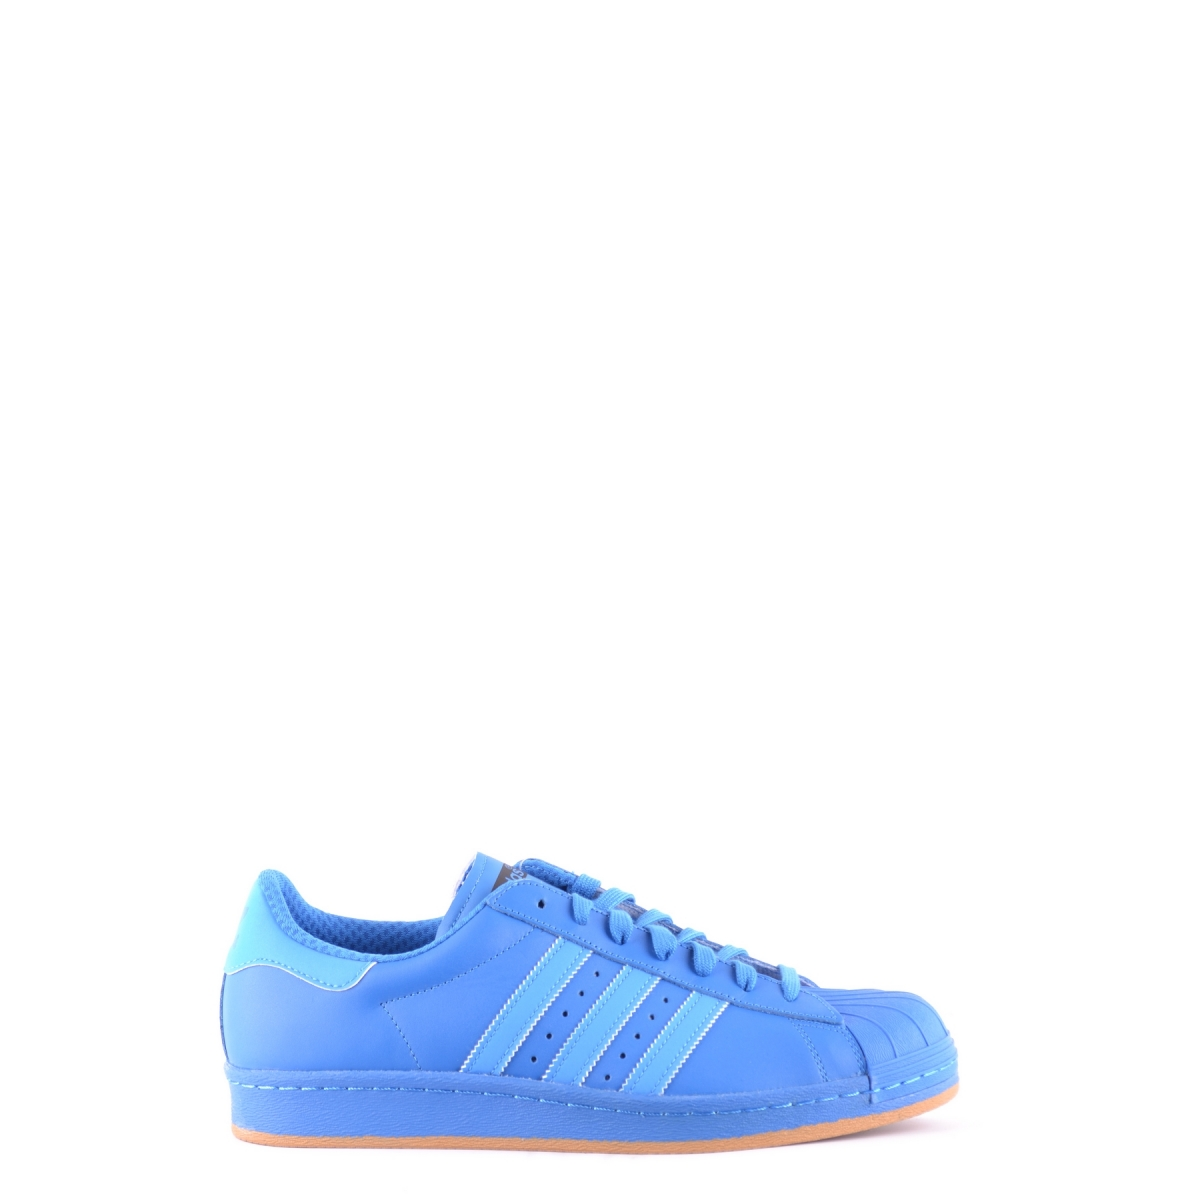 Scarpe casual da uomo uomo uomo  Sneakers Adidas 32736IT -20% 3c65bb